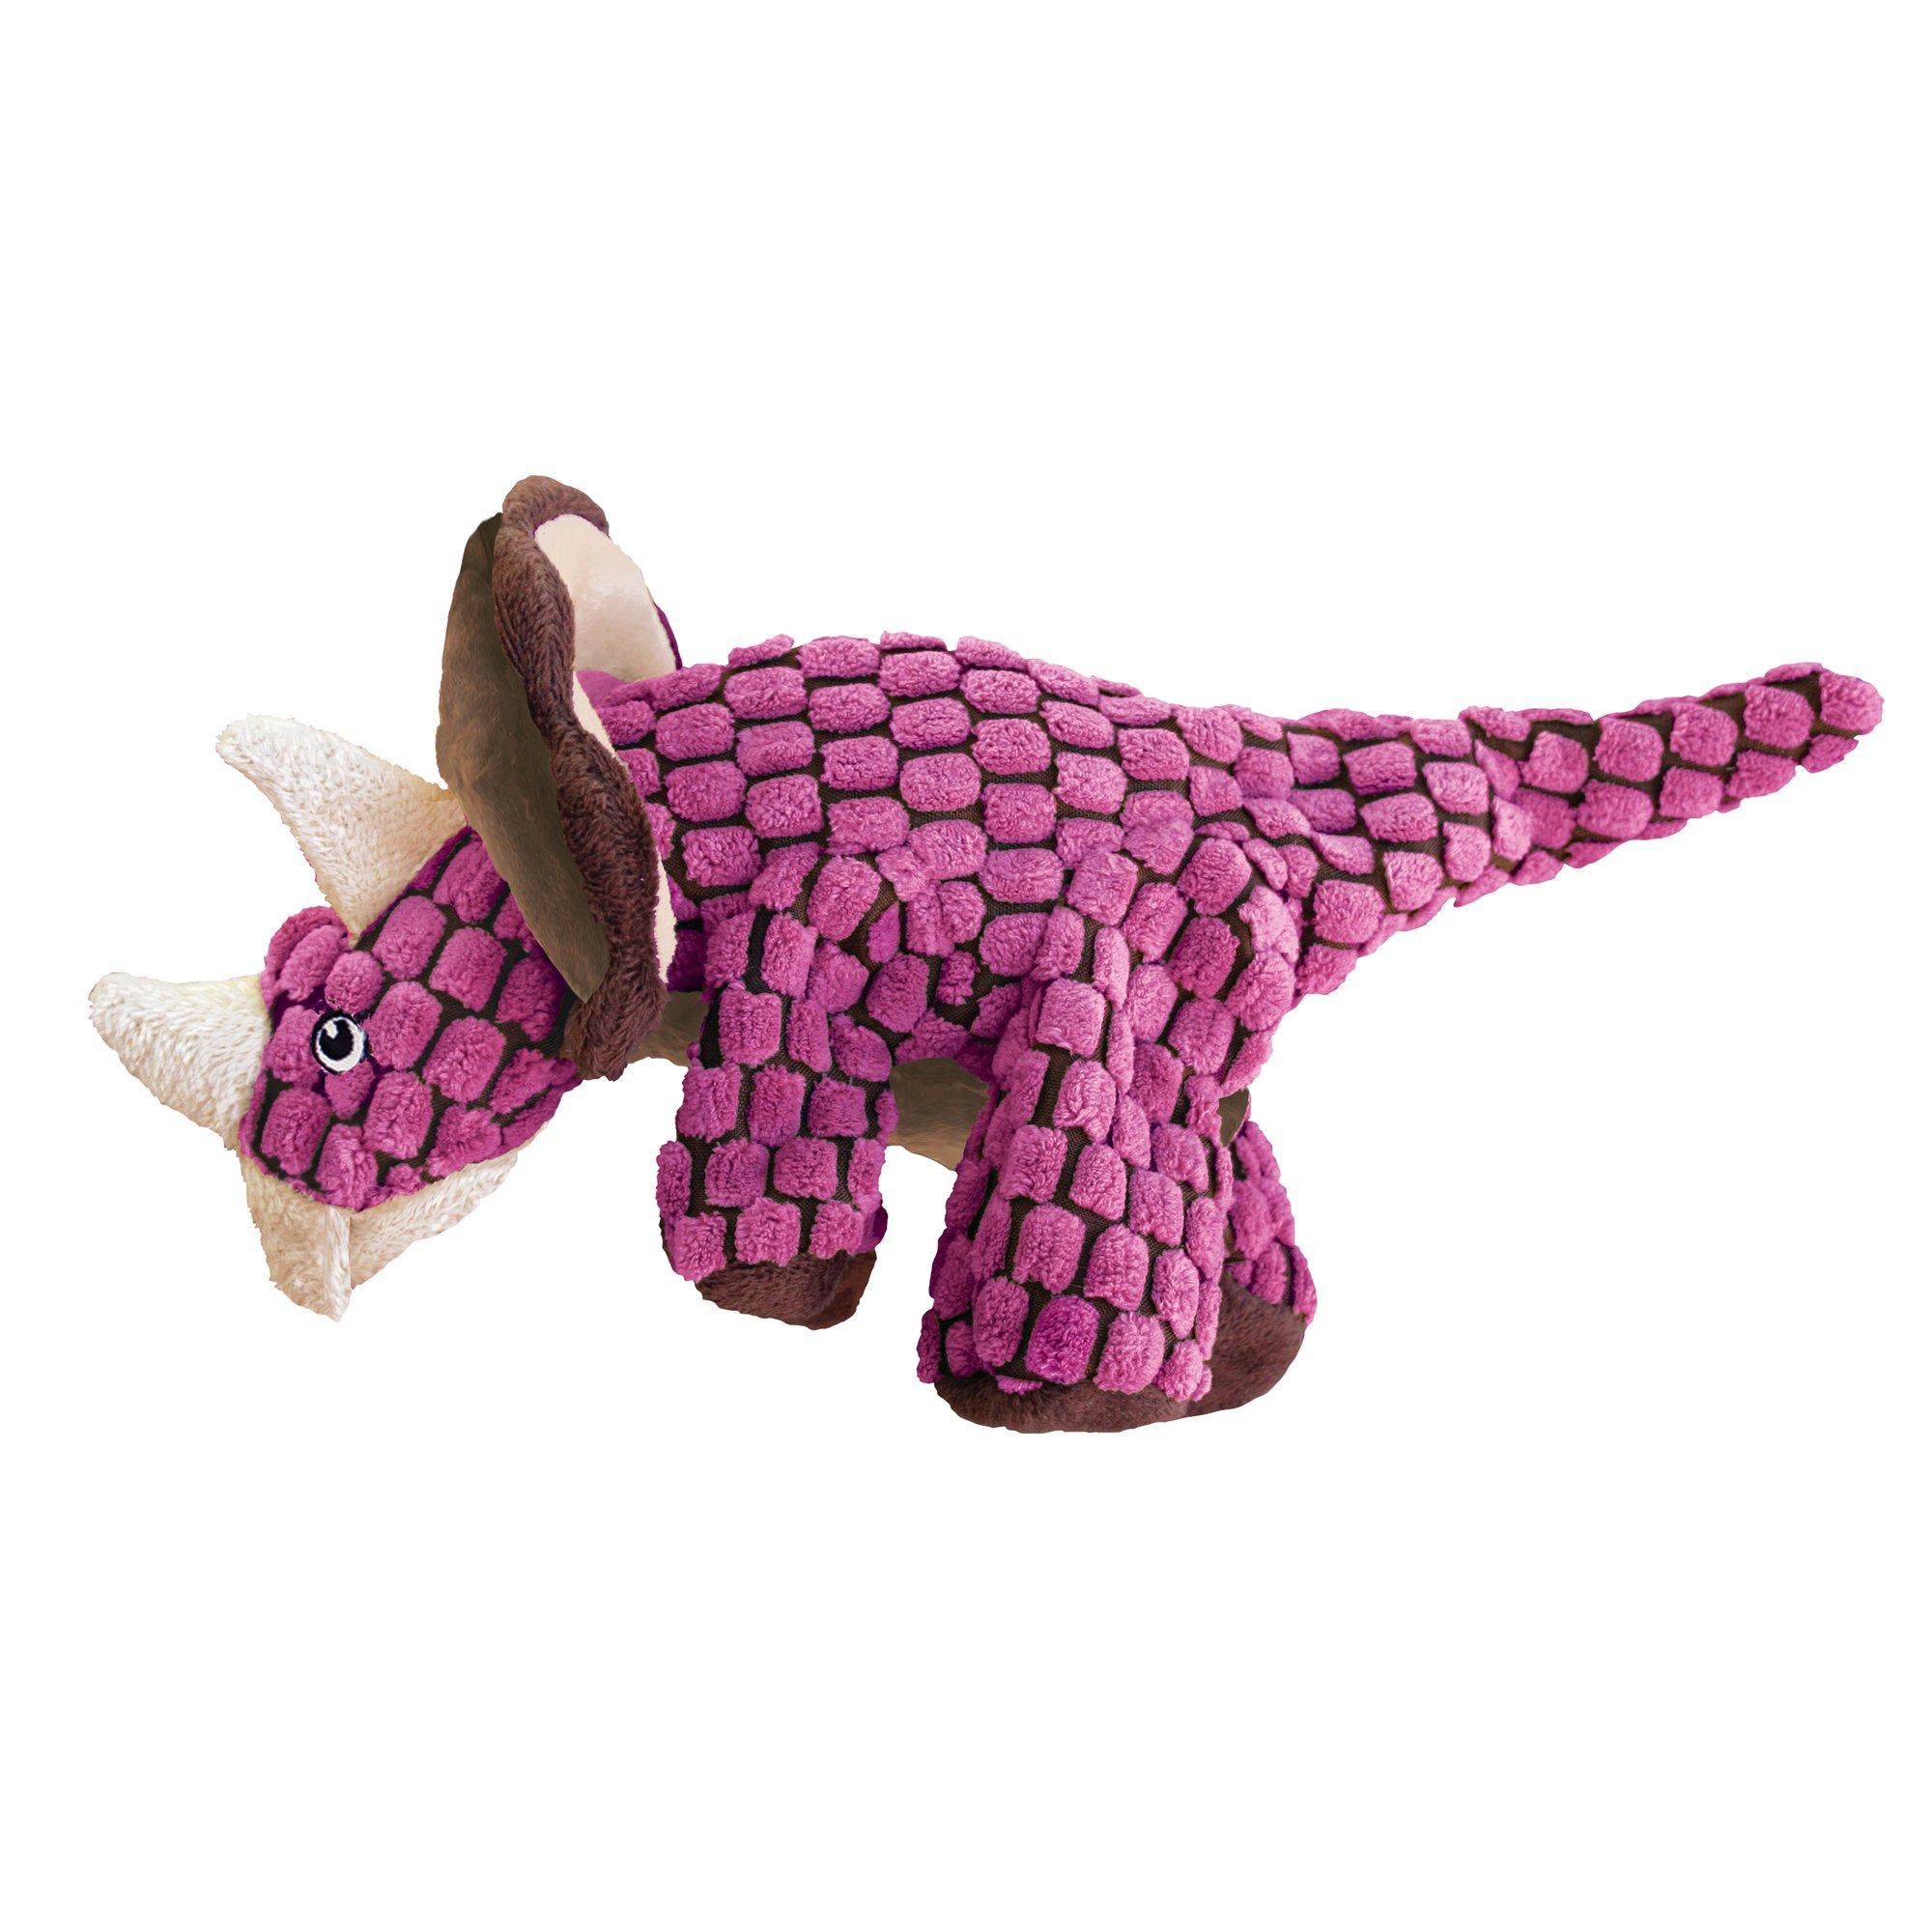 Pink Dog Toy : Kong dynos triceratops pink dog toy petco